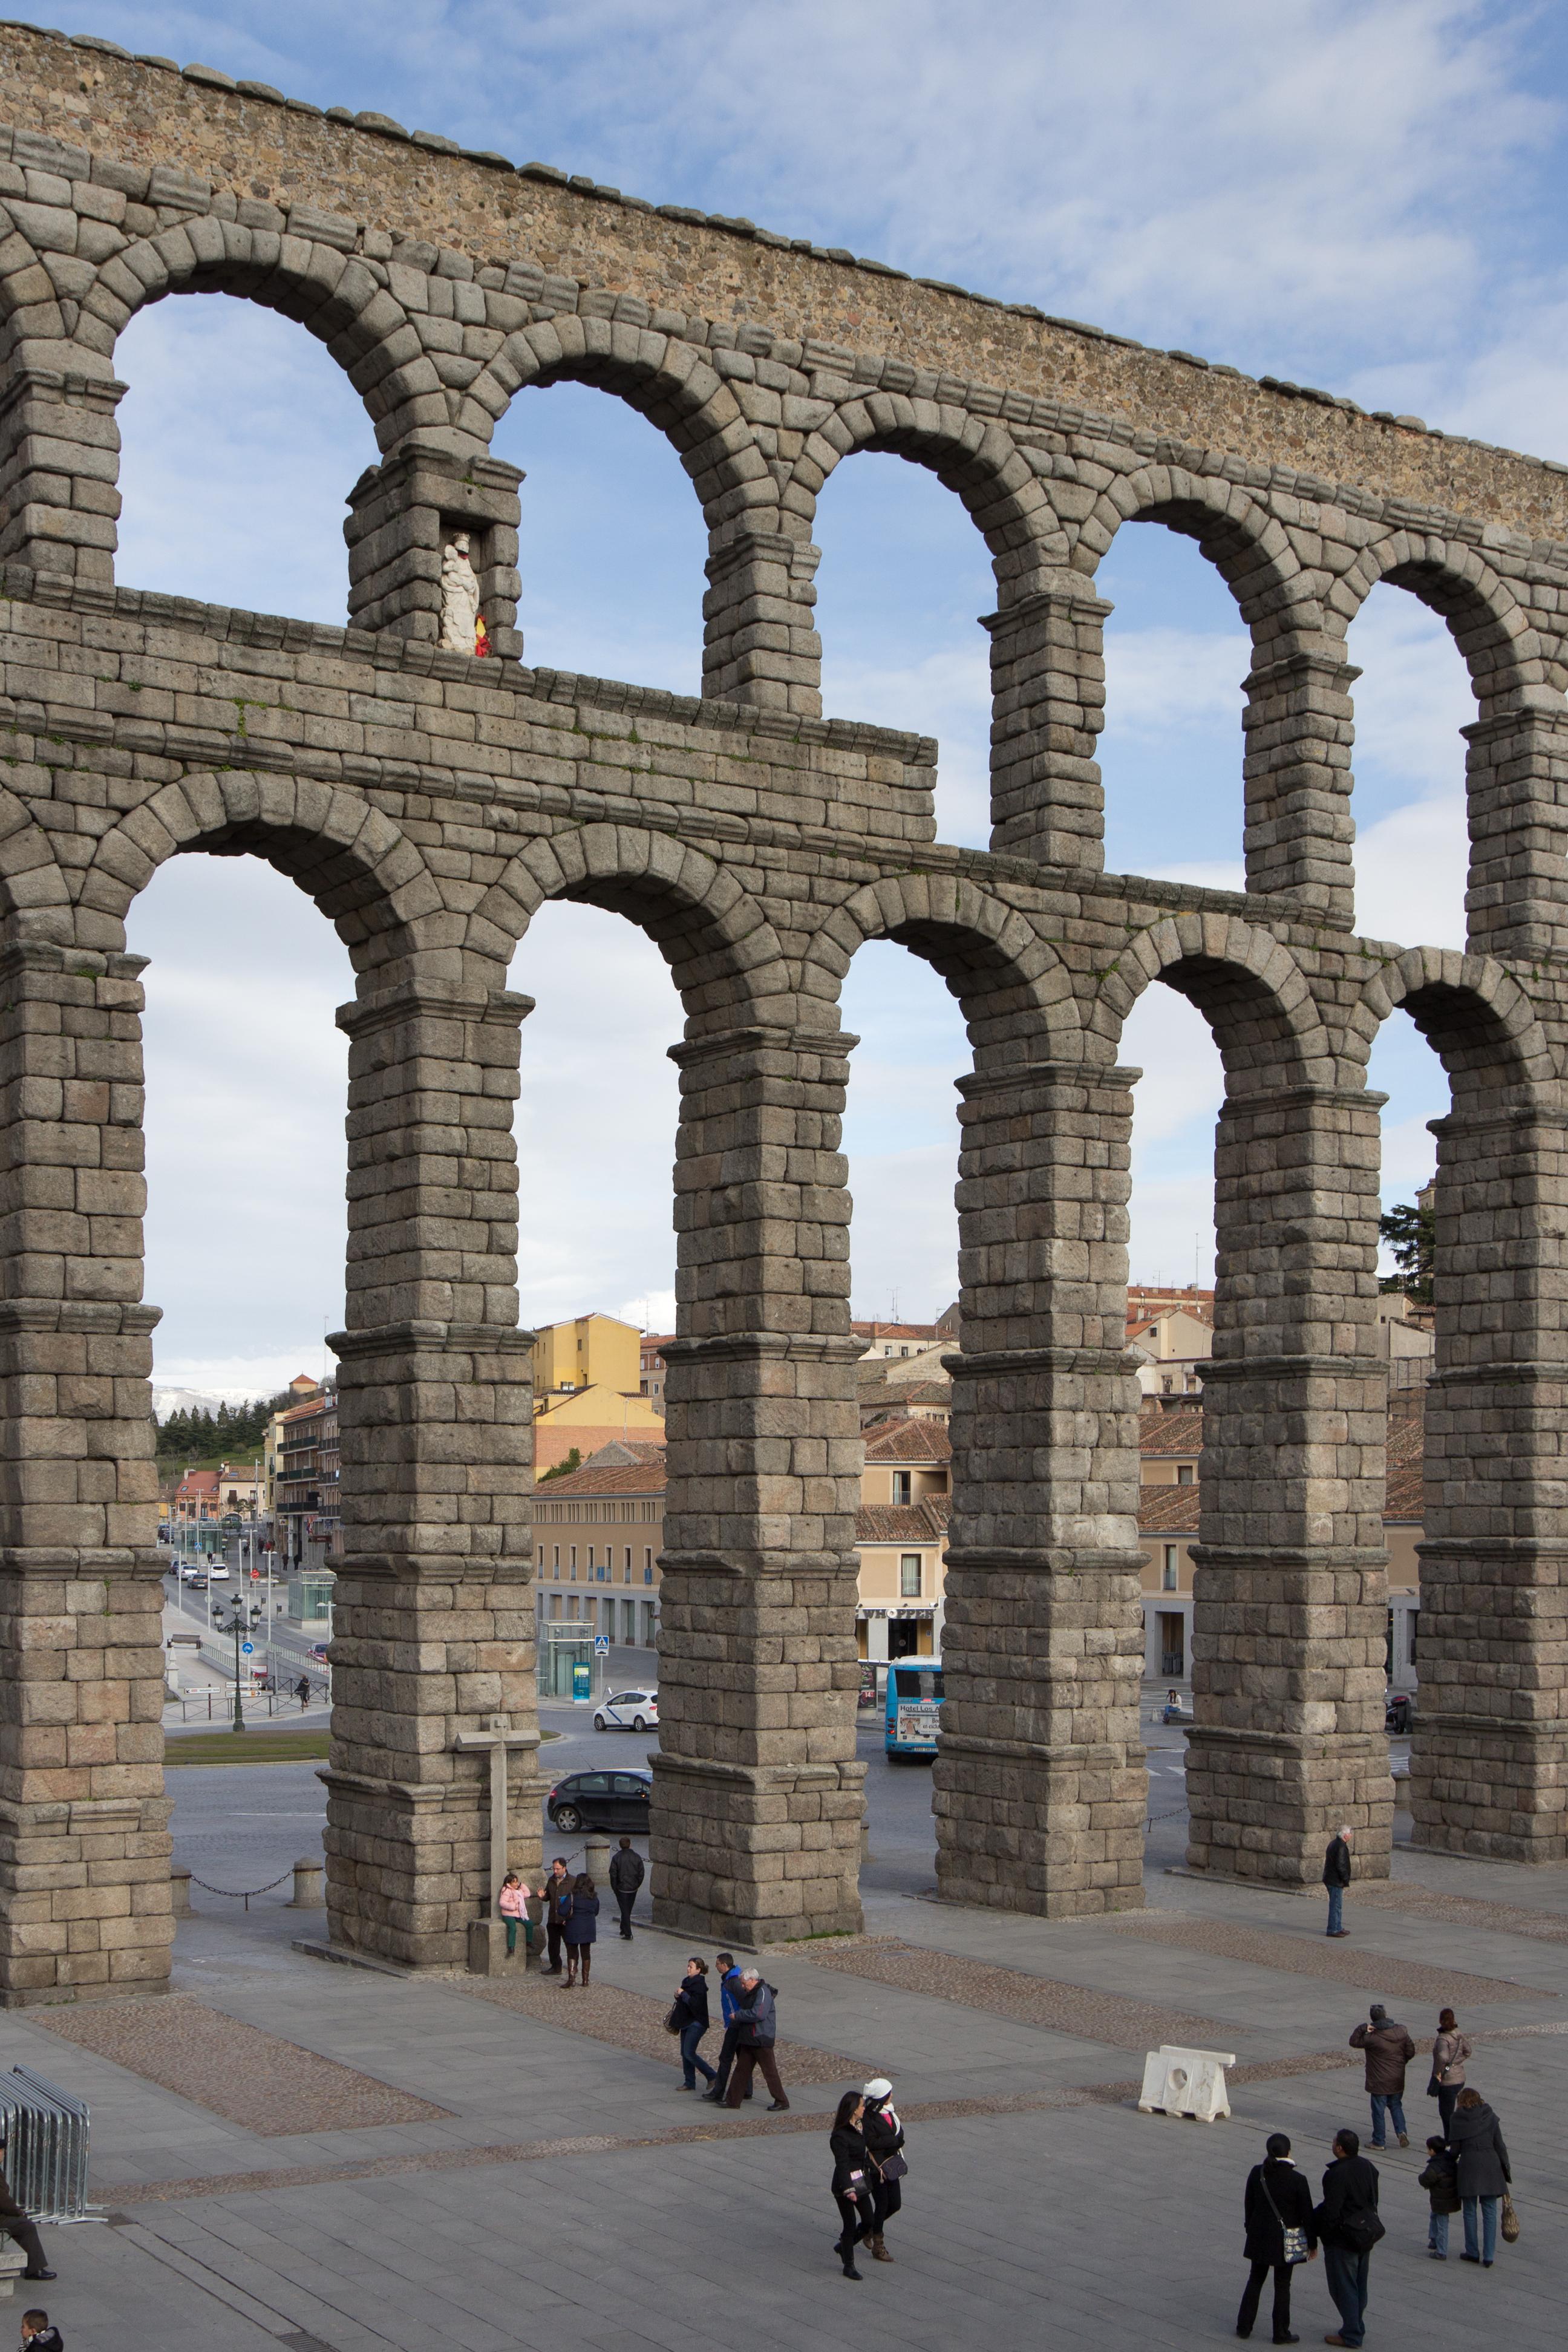 File:Acueducto de Segovia - 15.jpg - Wikimedia Commons